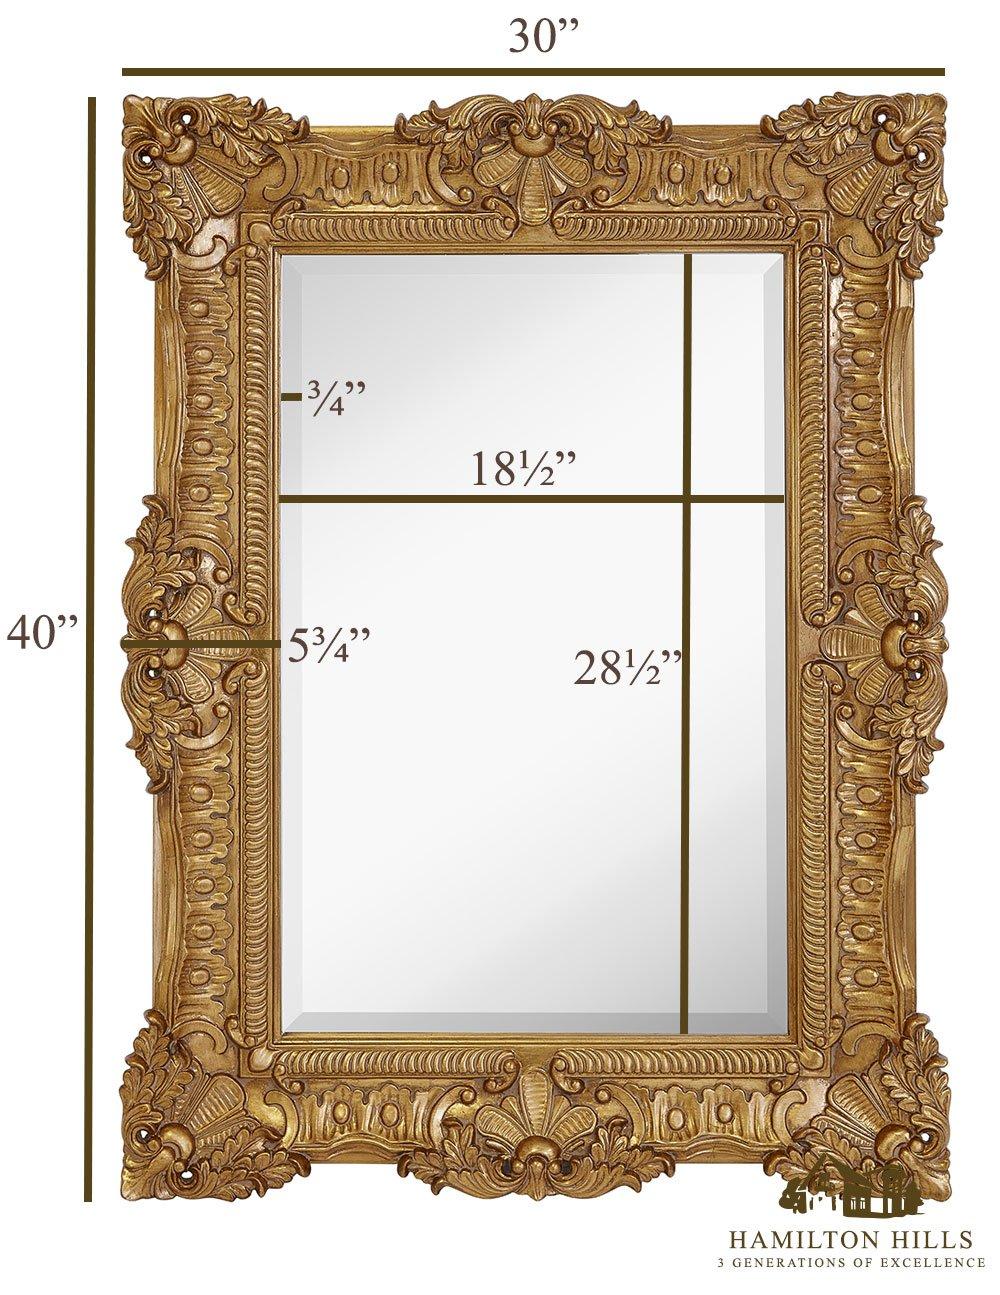 Amazon.com: Hamilton Hills Large Ornate Gold Baroque Frame Mirror ...